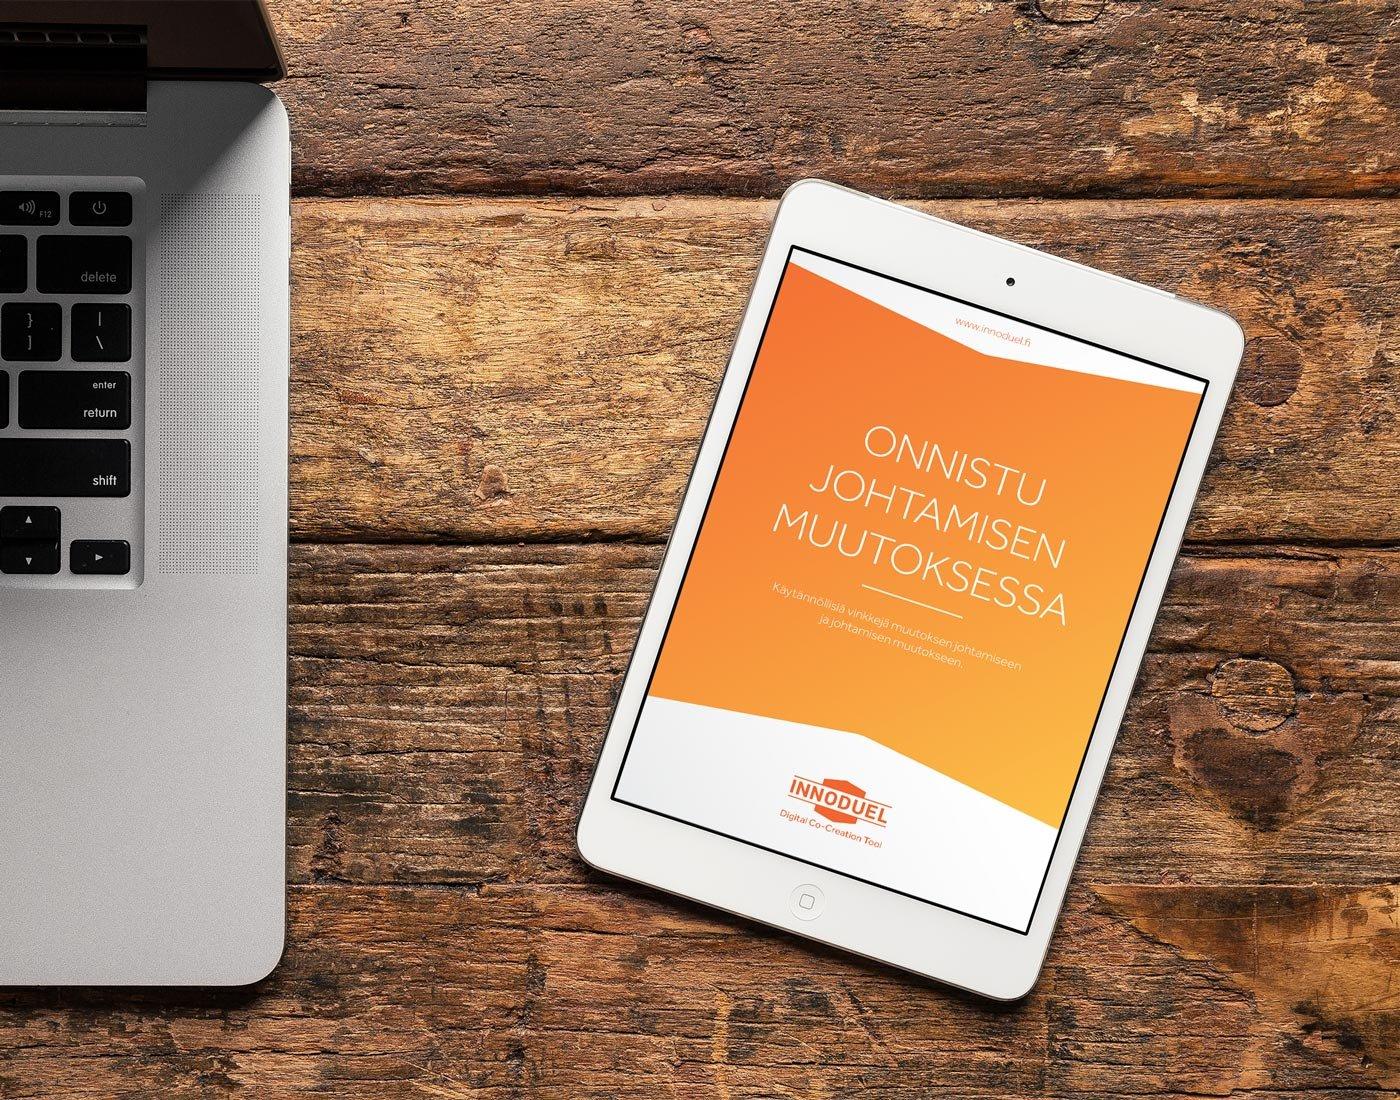 Onnistu johtamisen muutoksessa eBook | Innoduel